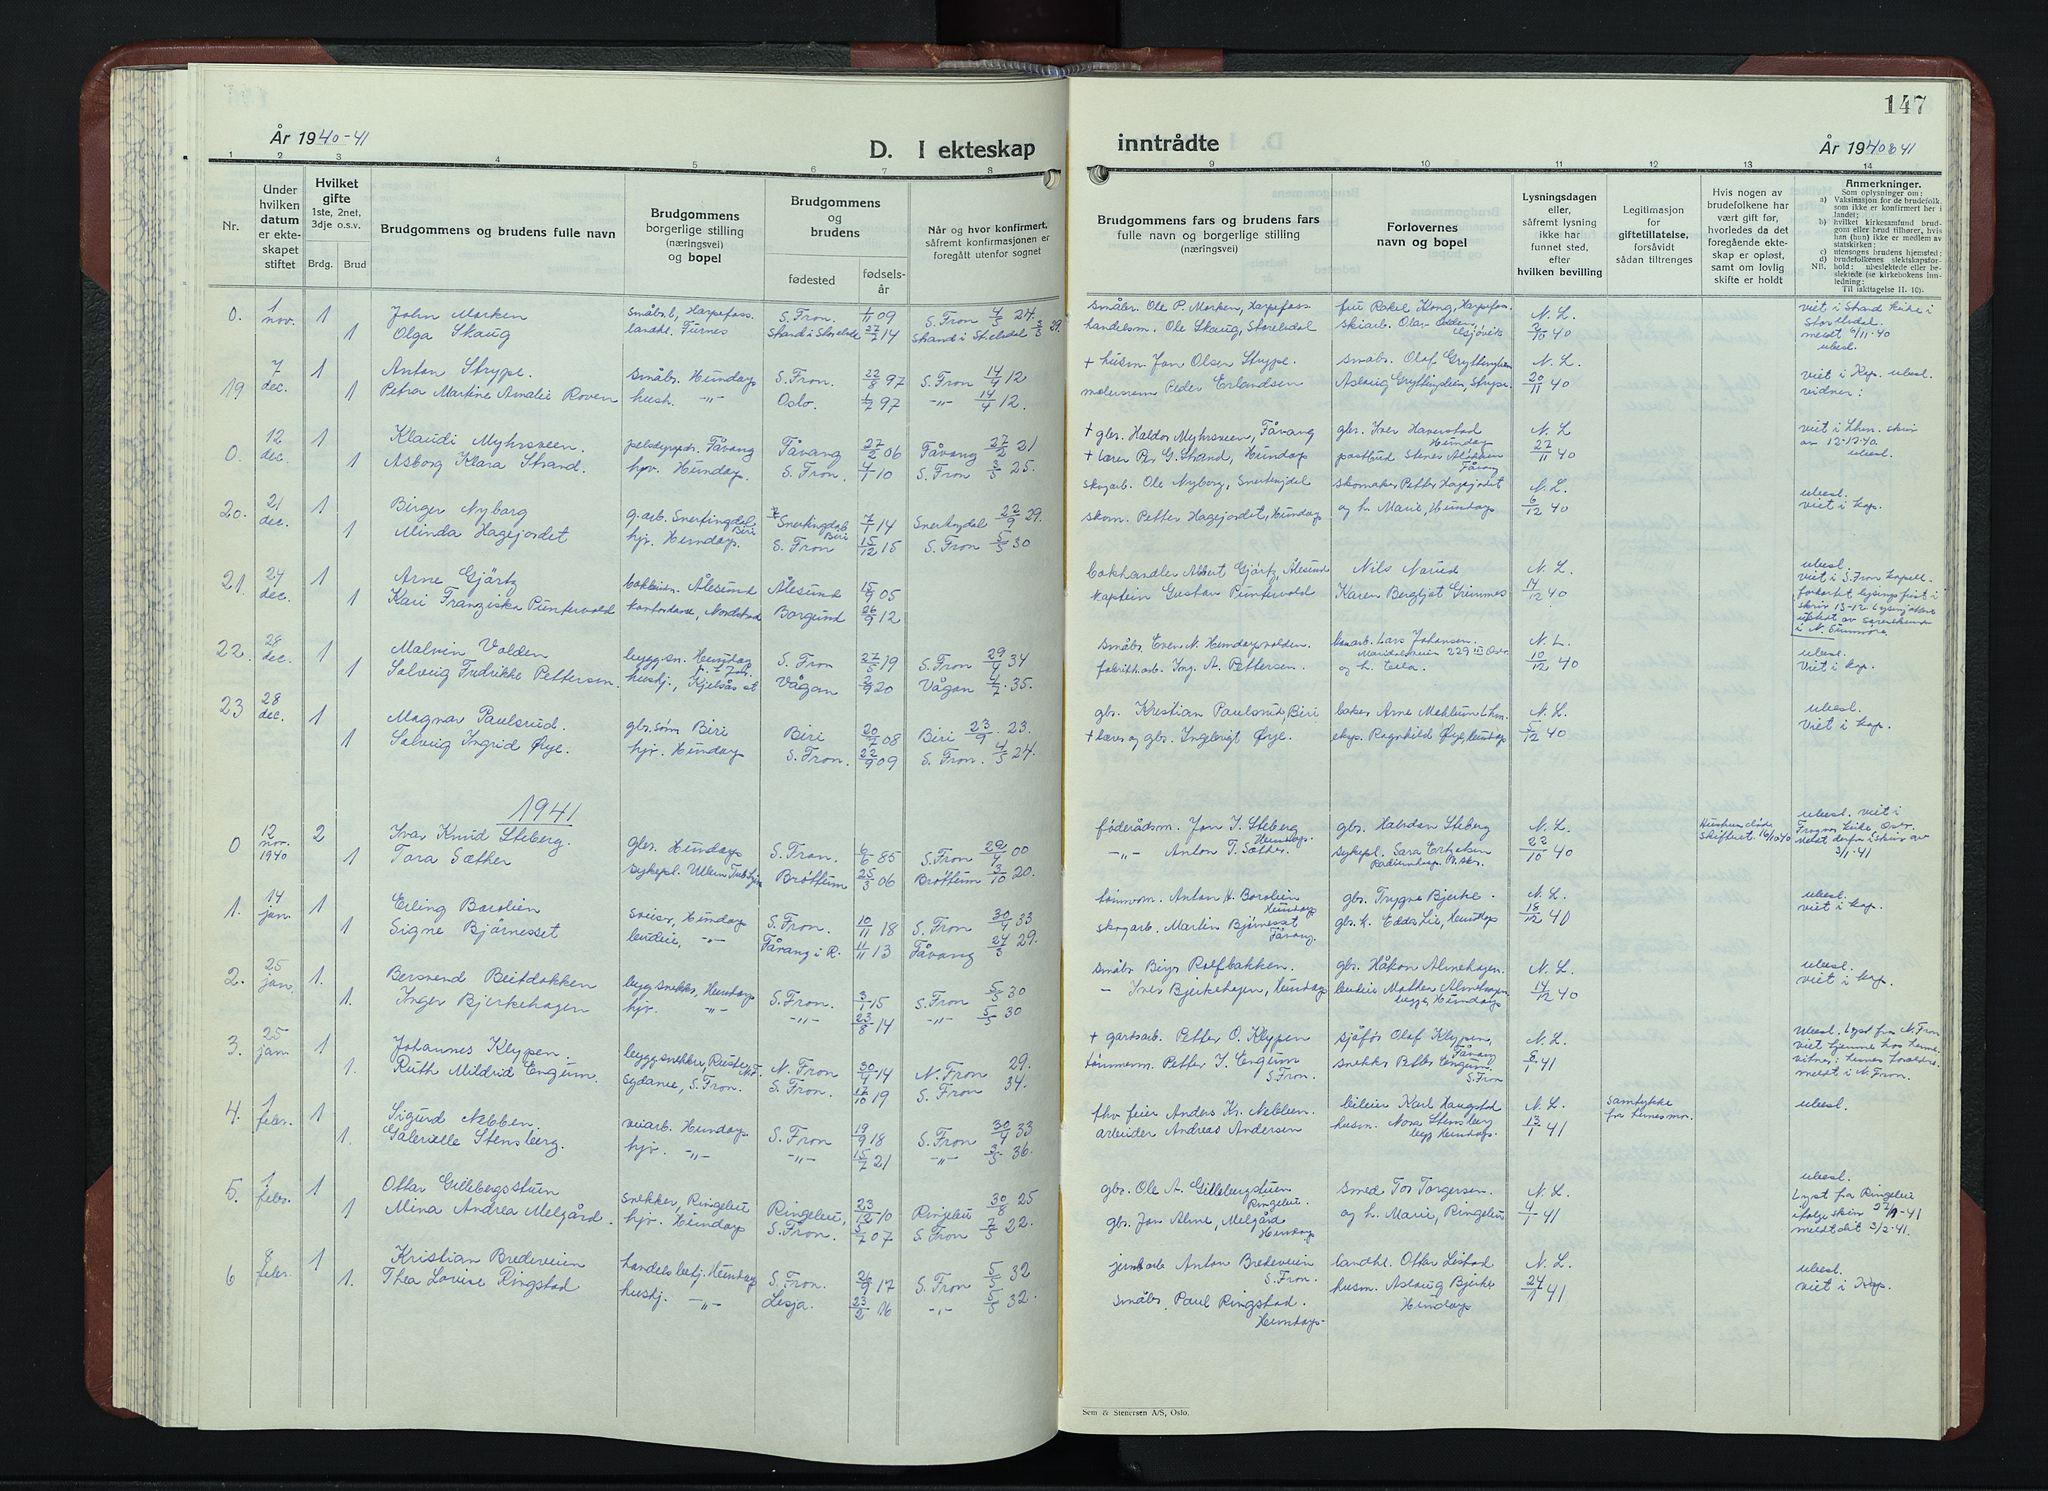 SAH, Sør-Fron prestekontor, H/Ha/Hab/L0006: Klokkerbok nr. 6, 1933-1948, s. 147